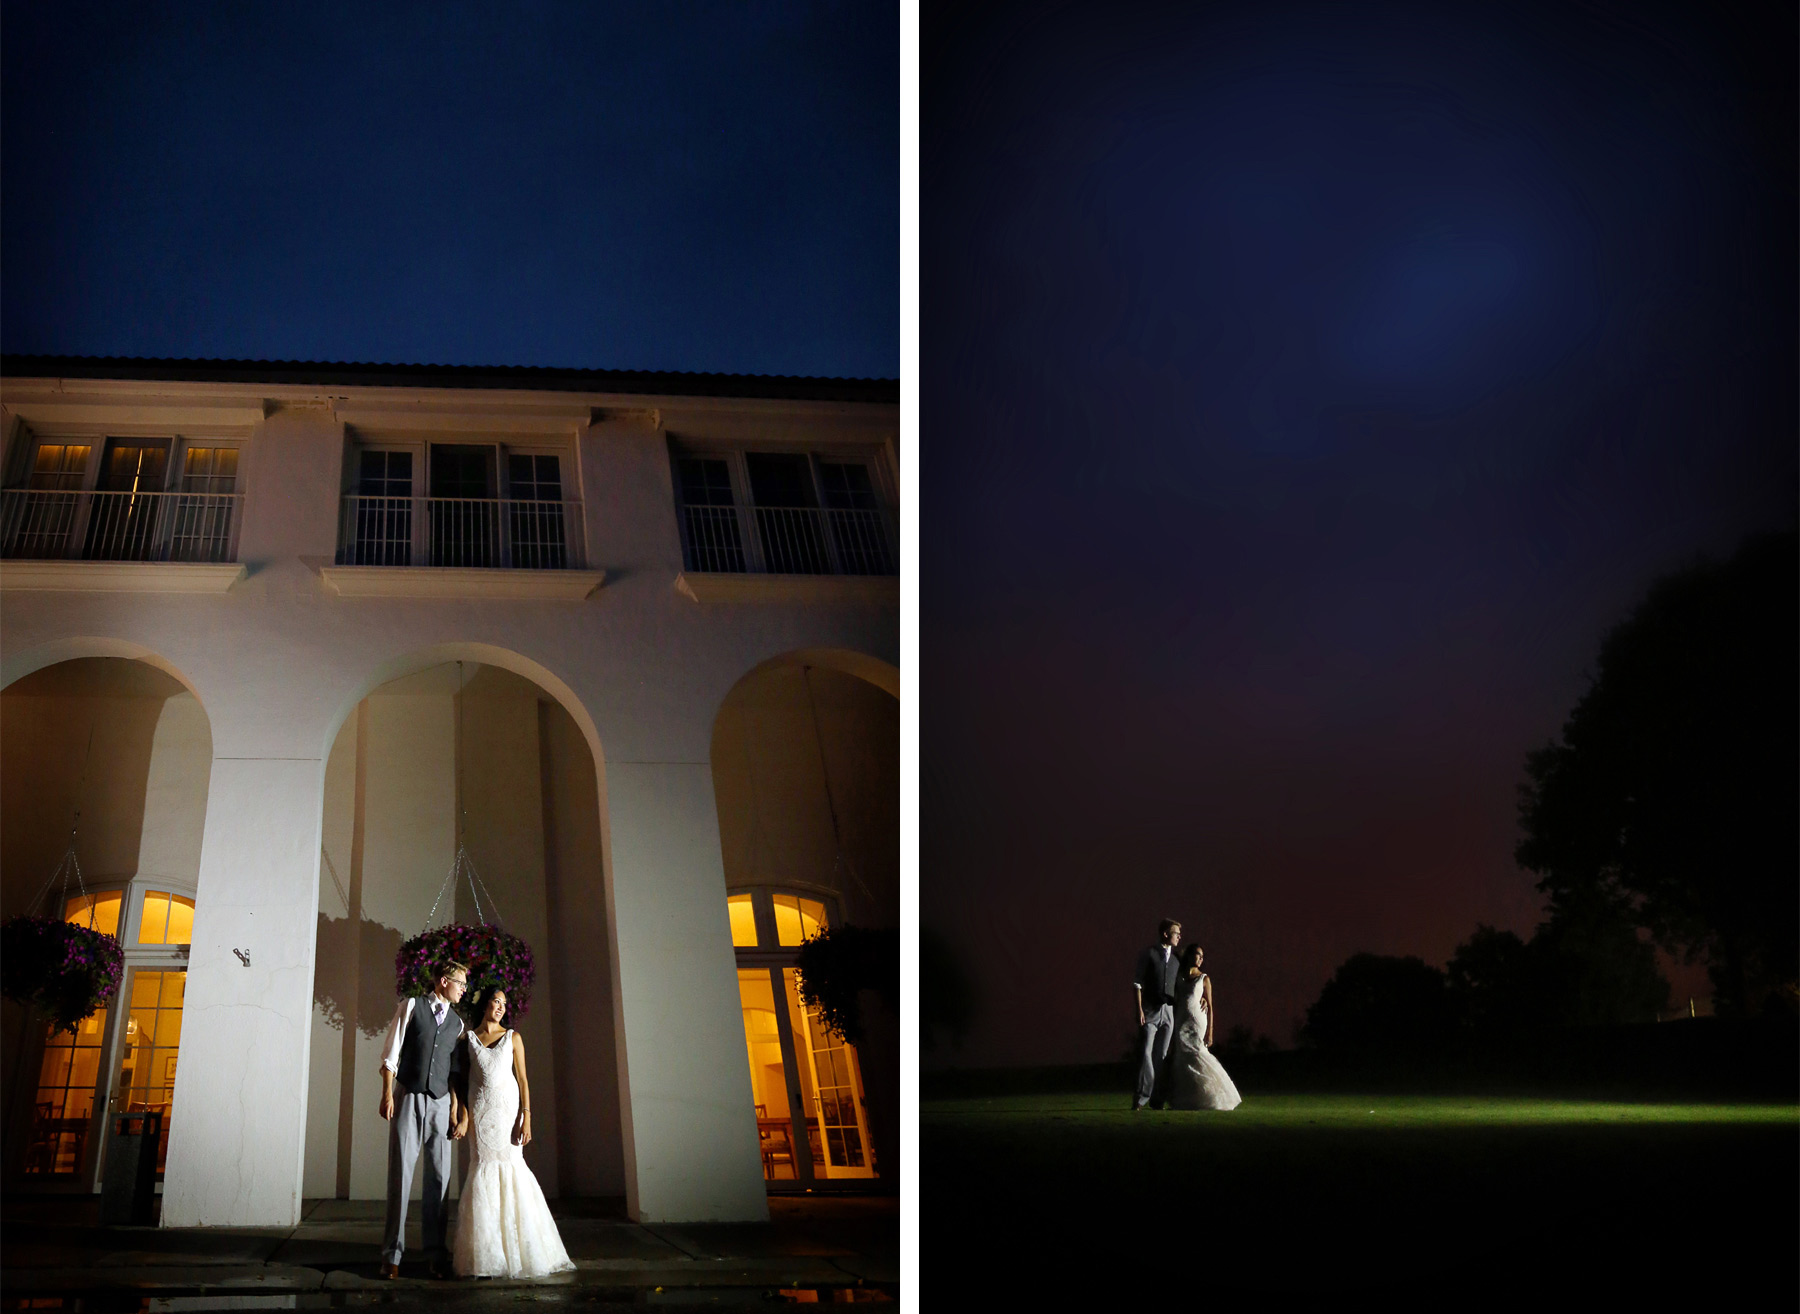 18-Minneapolis-Minnesota-Wedding-Photography-by-Vick-Photography-Lafayette-Country-Club-Night-Photography-Daphne-&-Austin.jpg